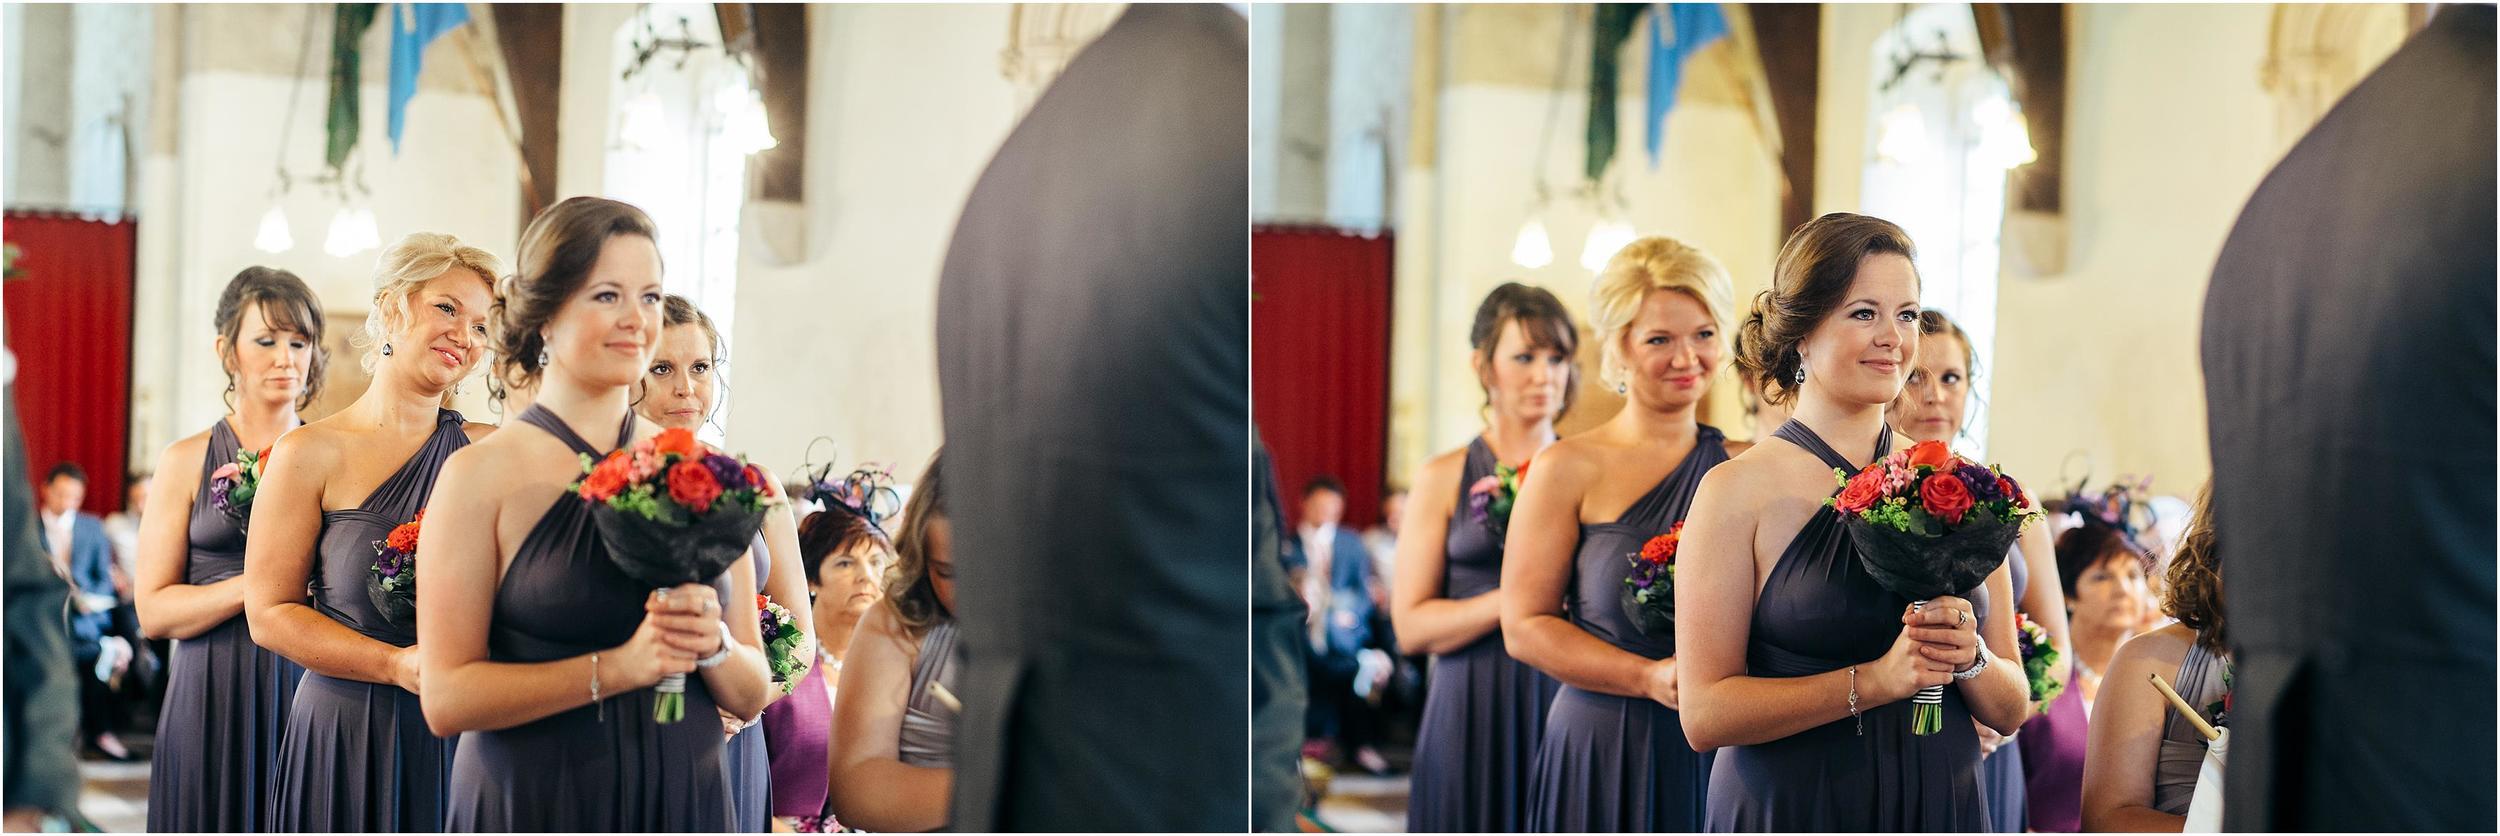 bowcombe lodge wedding_0036.jpg